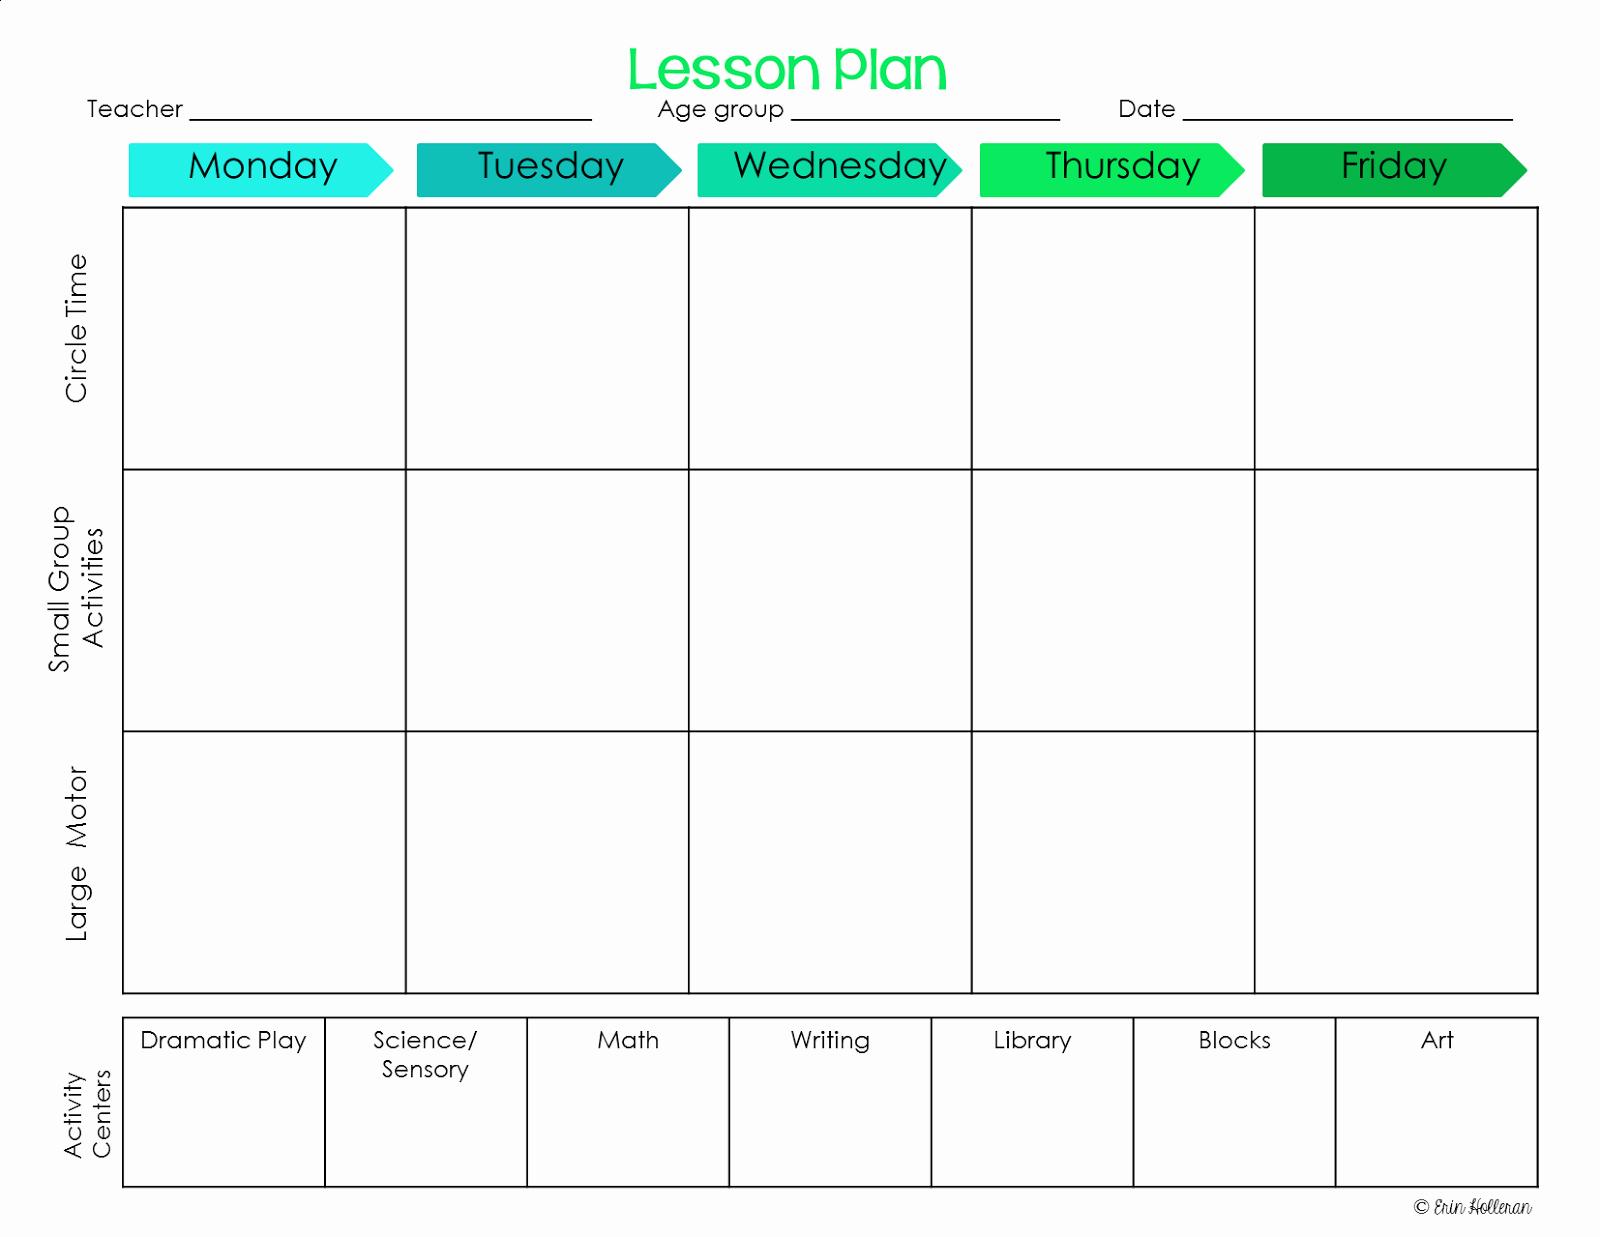 Toddler Lesson Plan Template Elegant Preschool Ponderings Make Your Lesson Plans Work for You